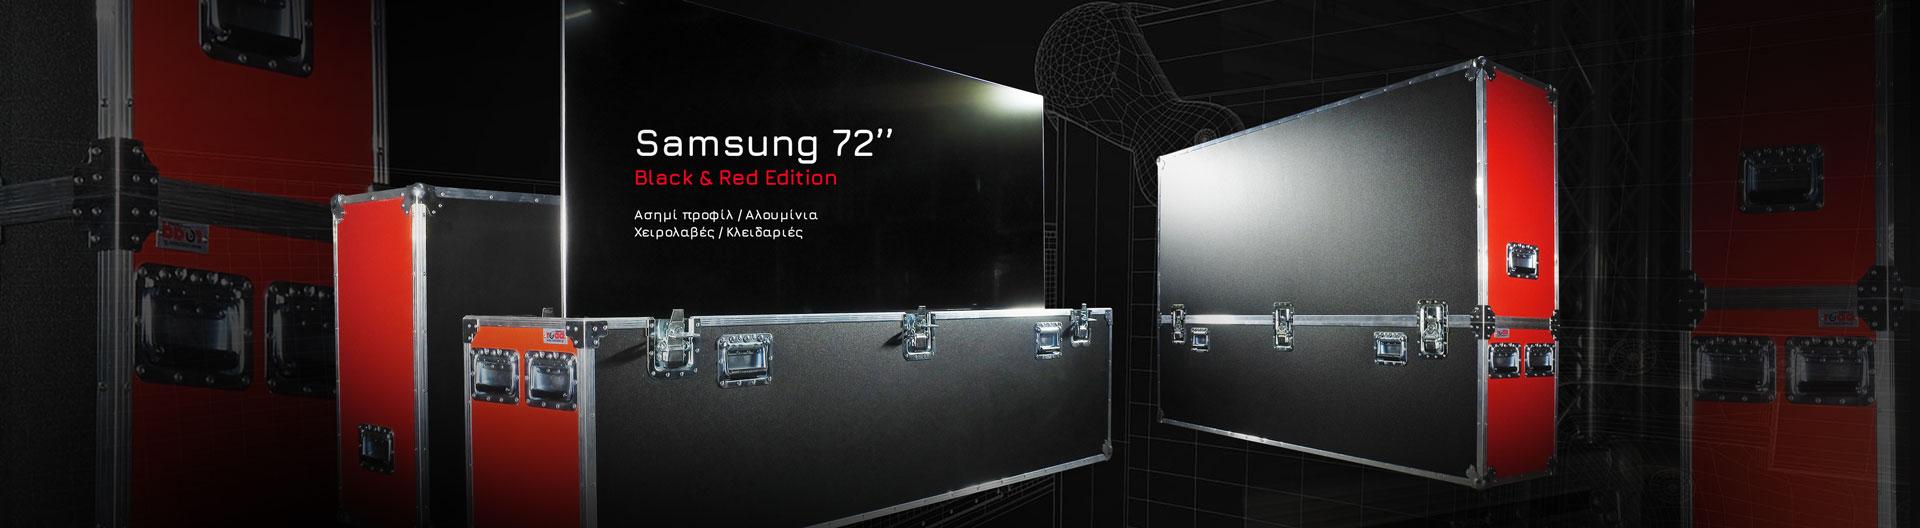 Samsung-72